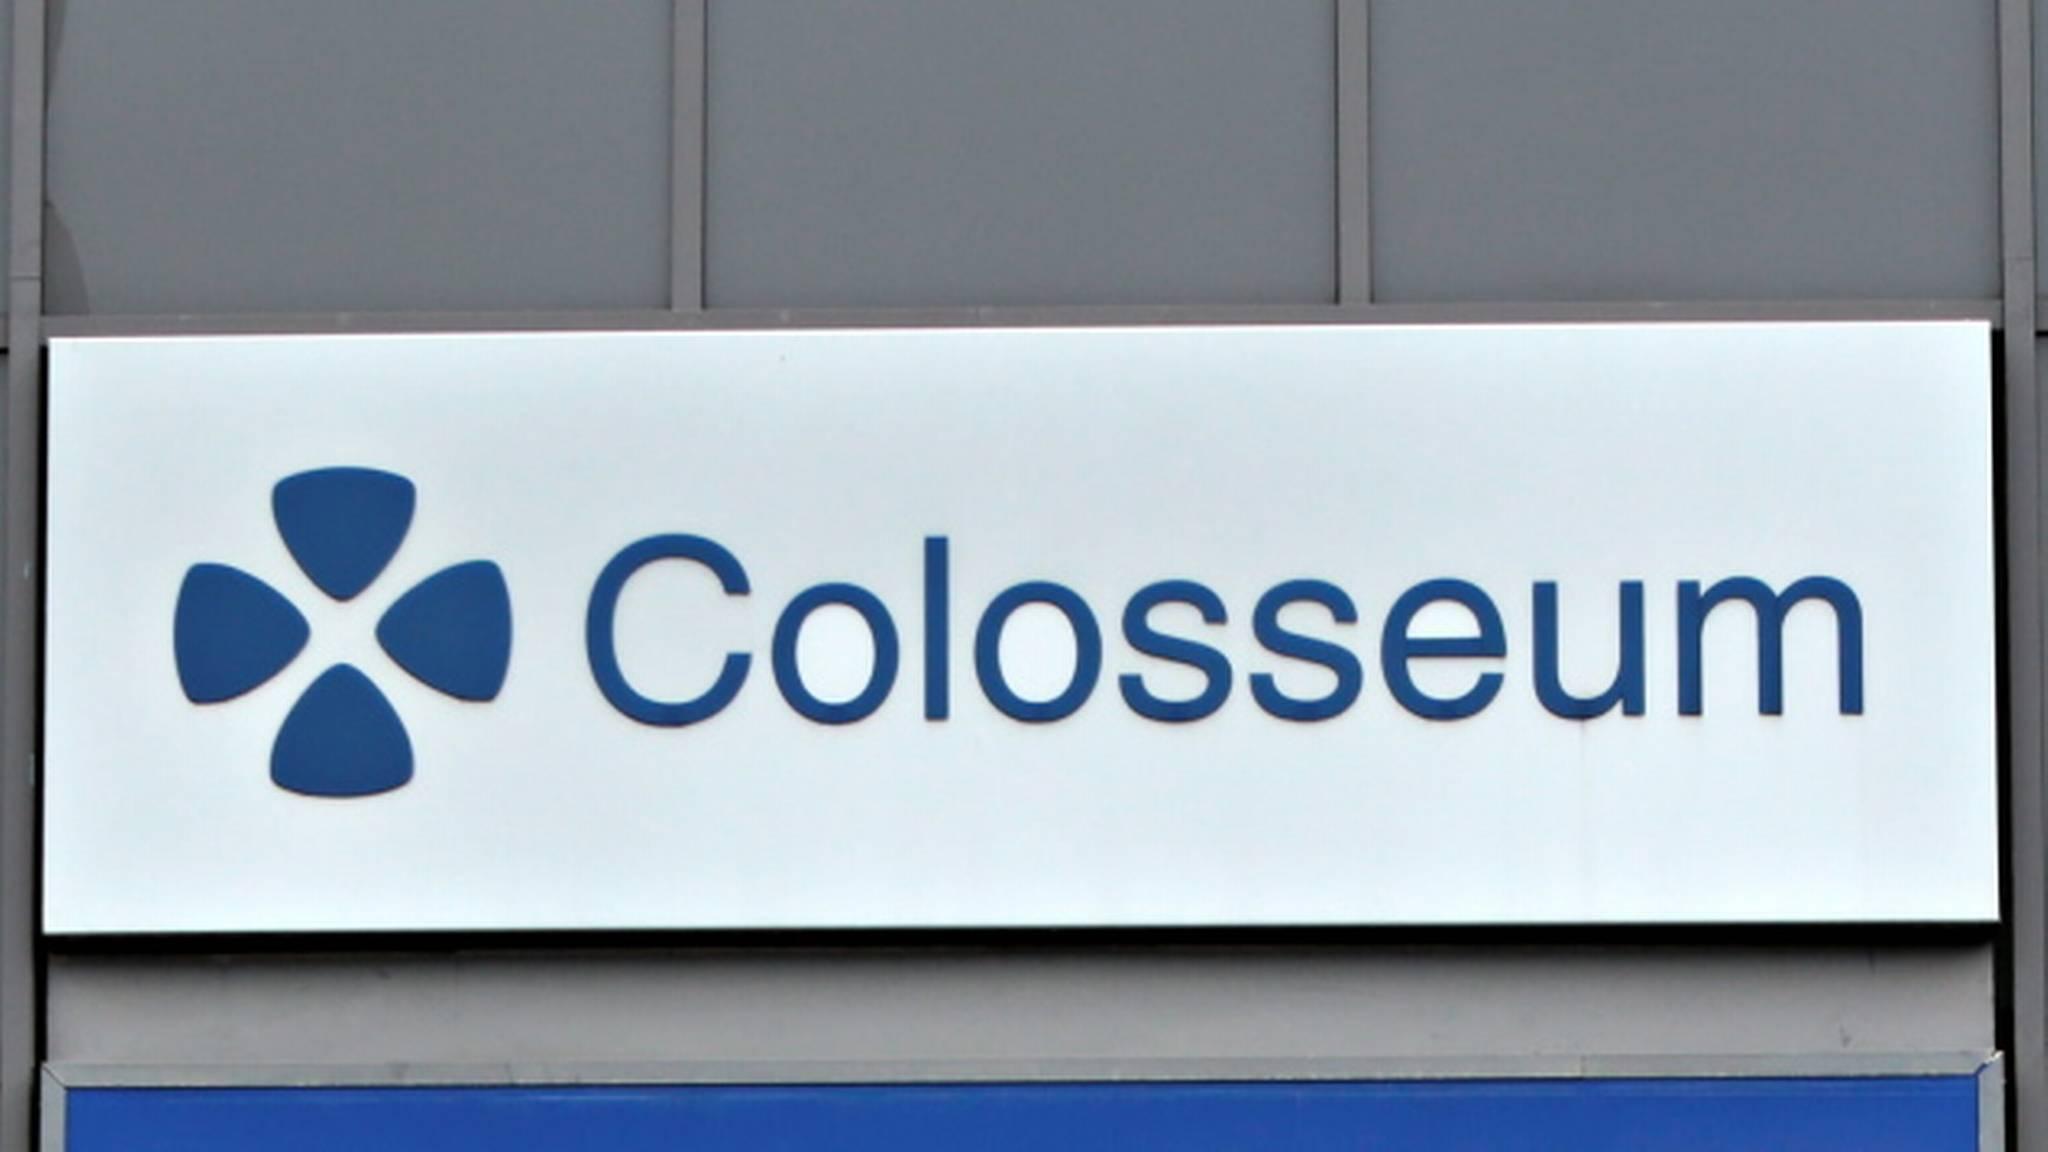 Colosseum tannhelse